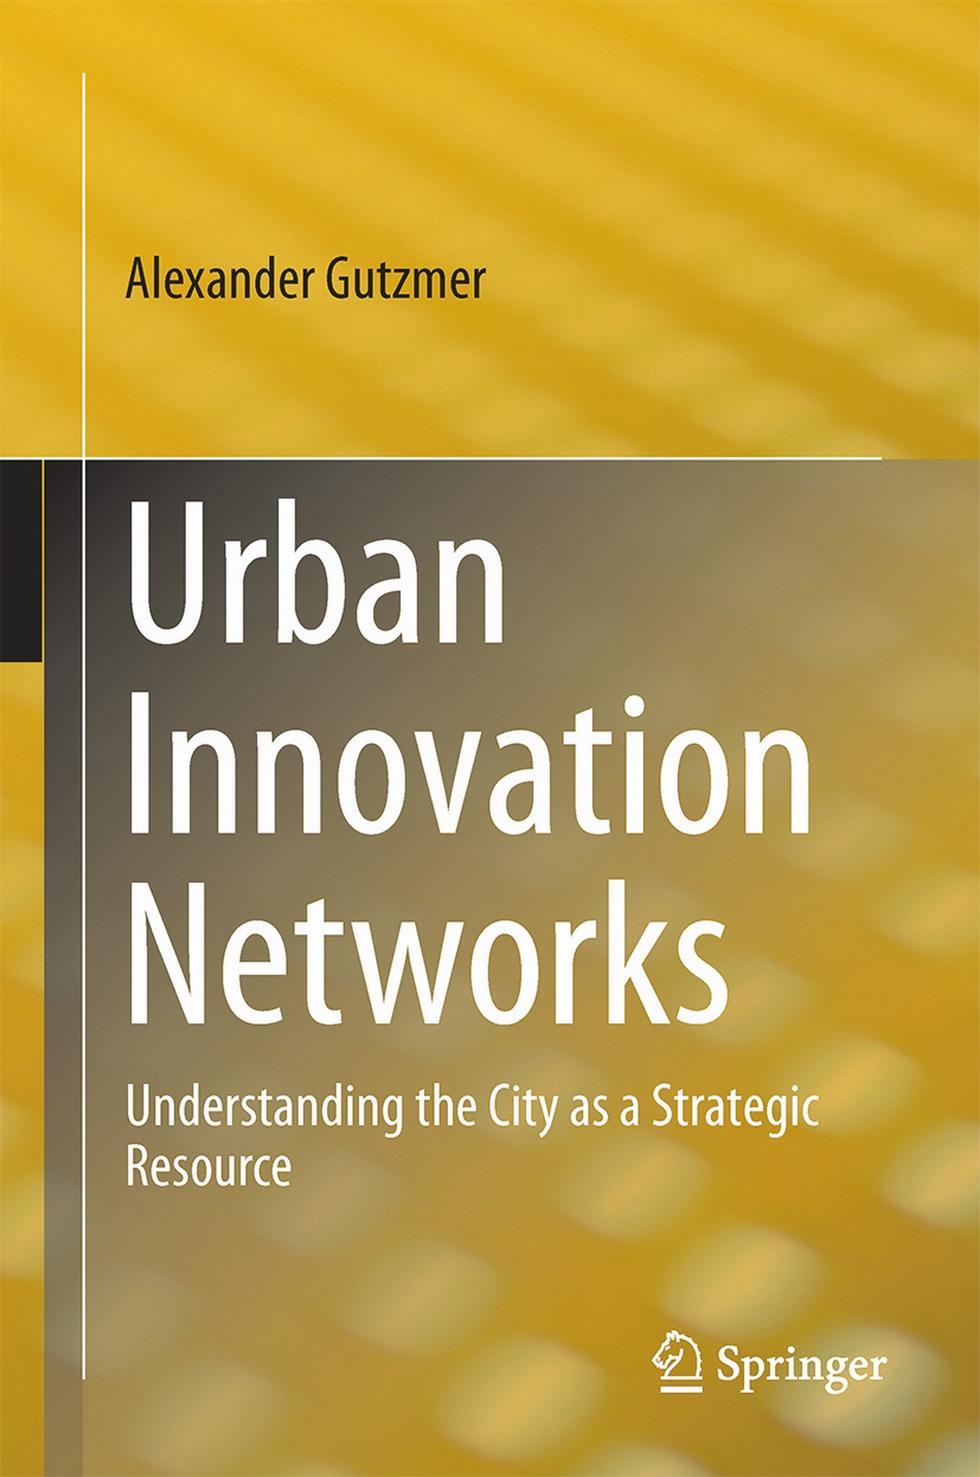 Alexander Gutzmer, Urban Innovation Networks